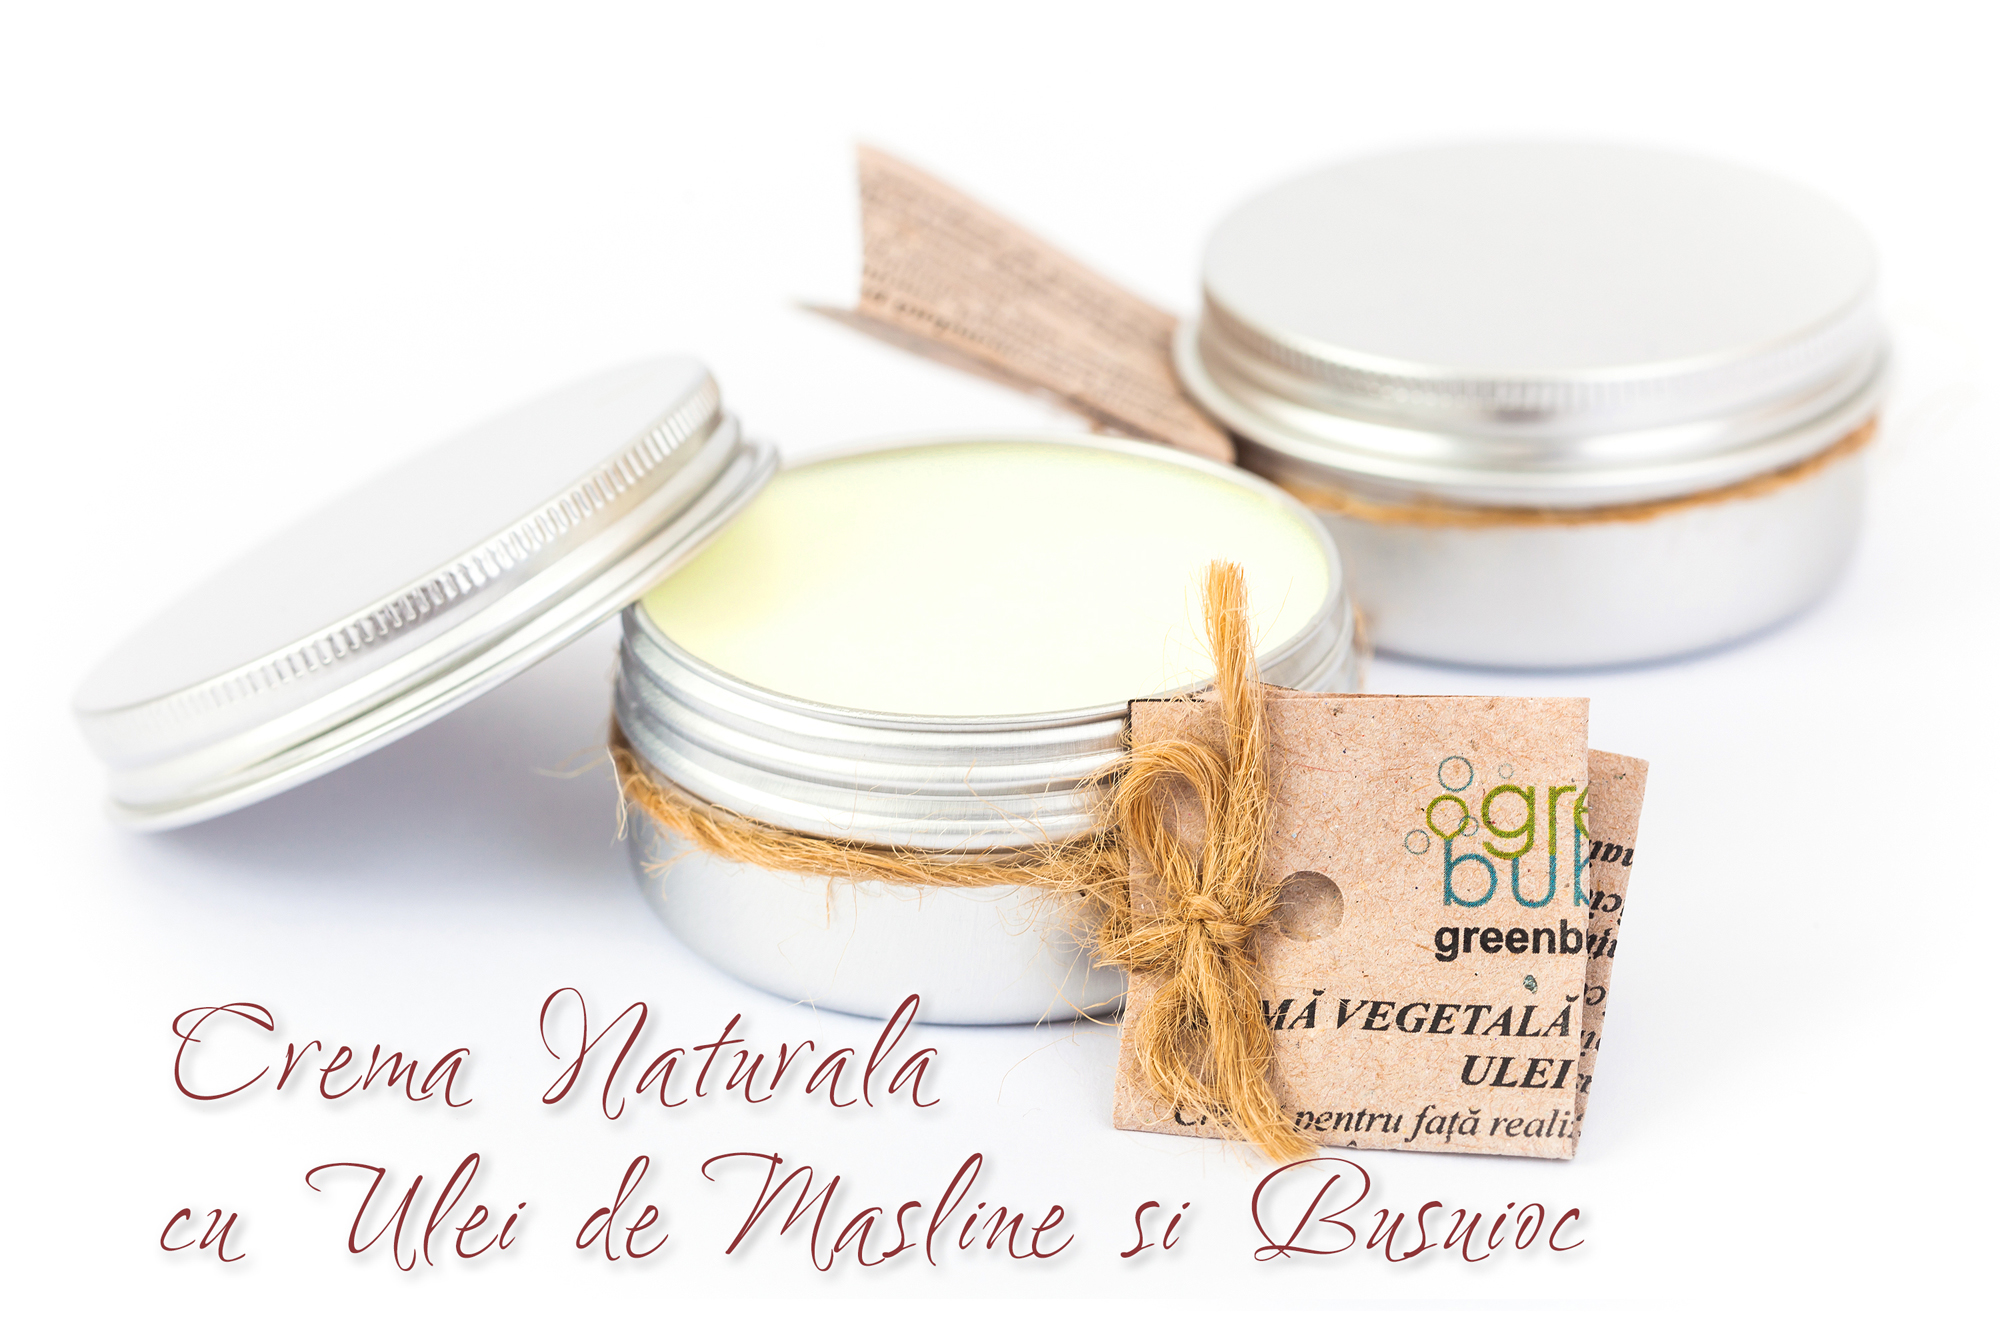 Crema Naturala cu Ulei de Masline si Busuioc